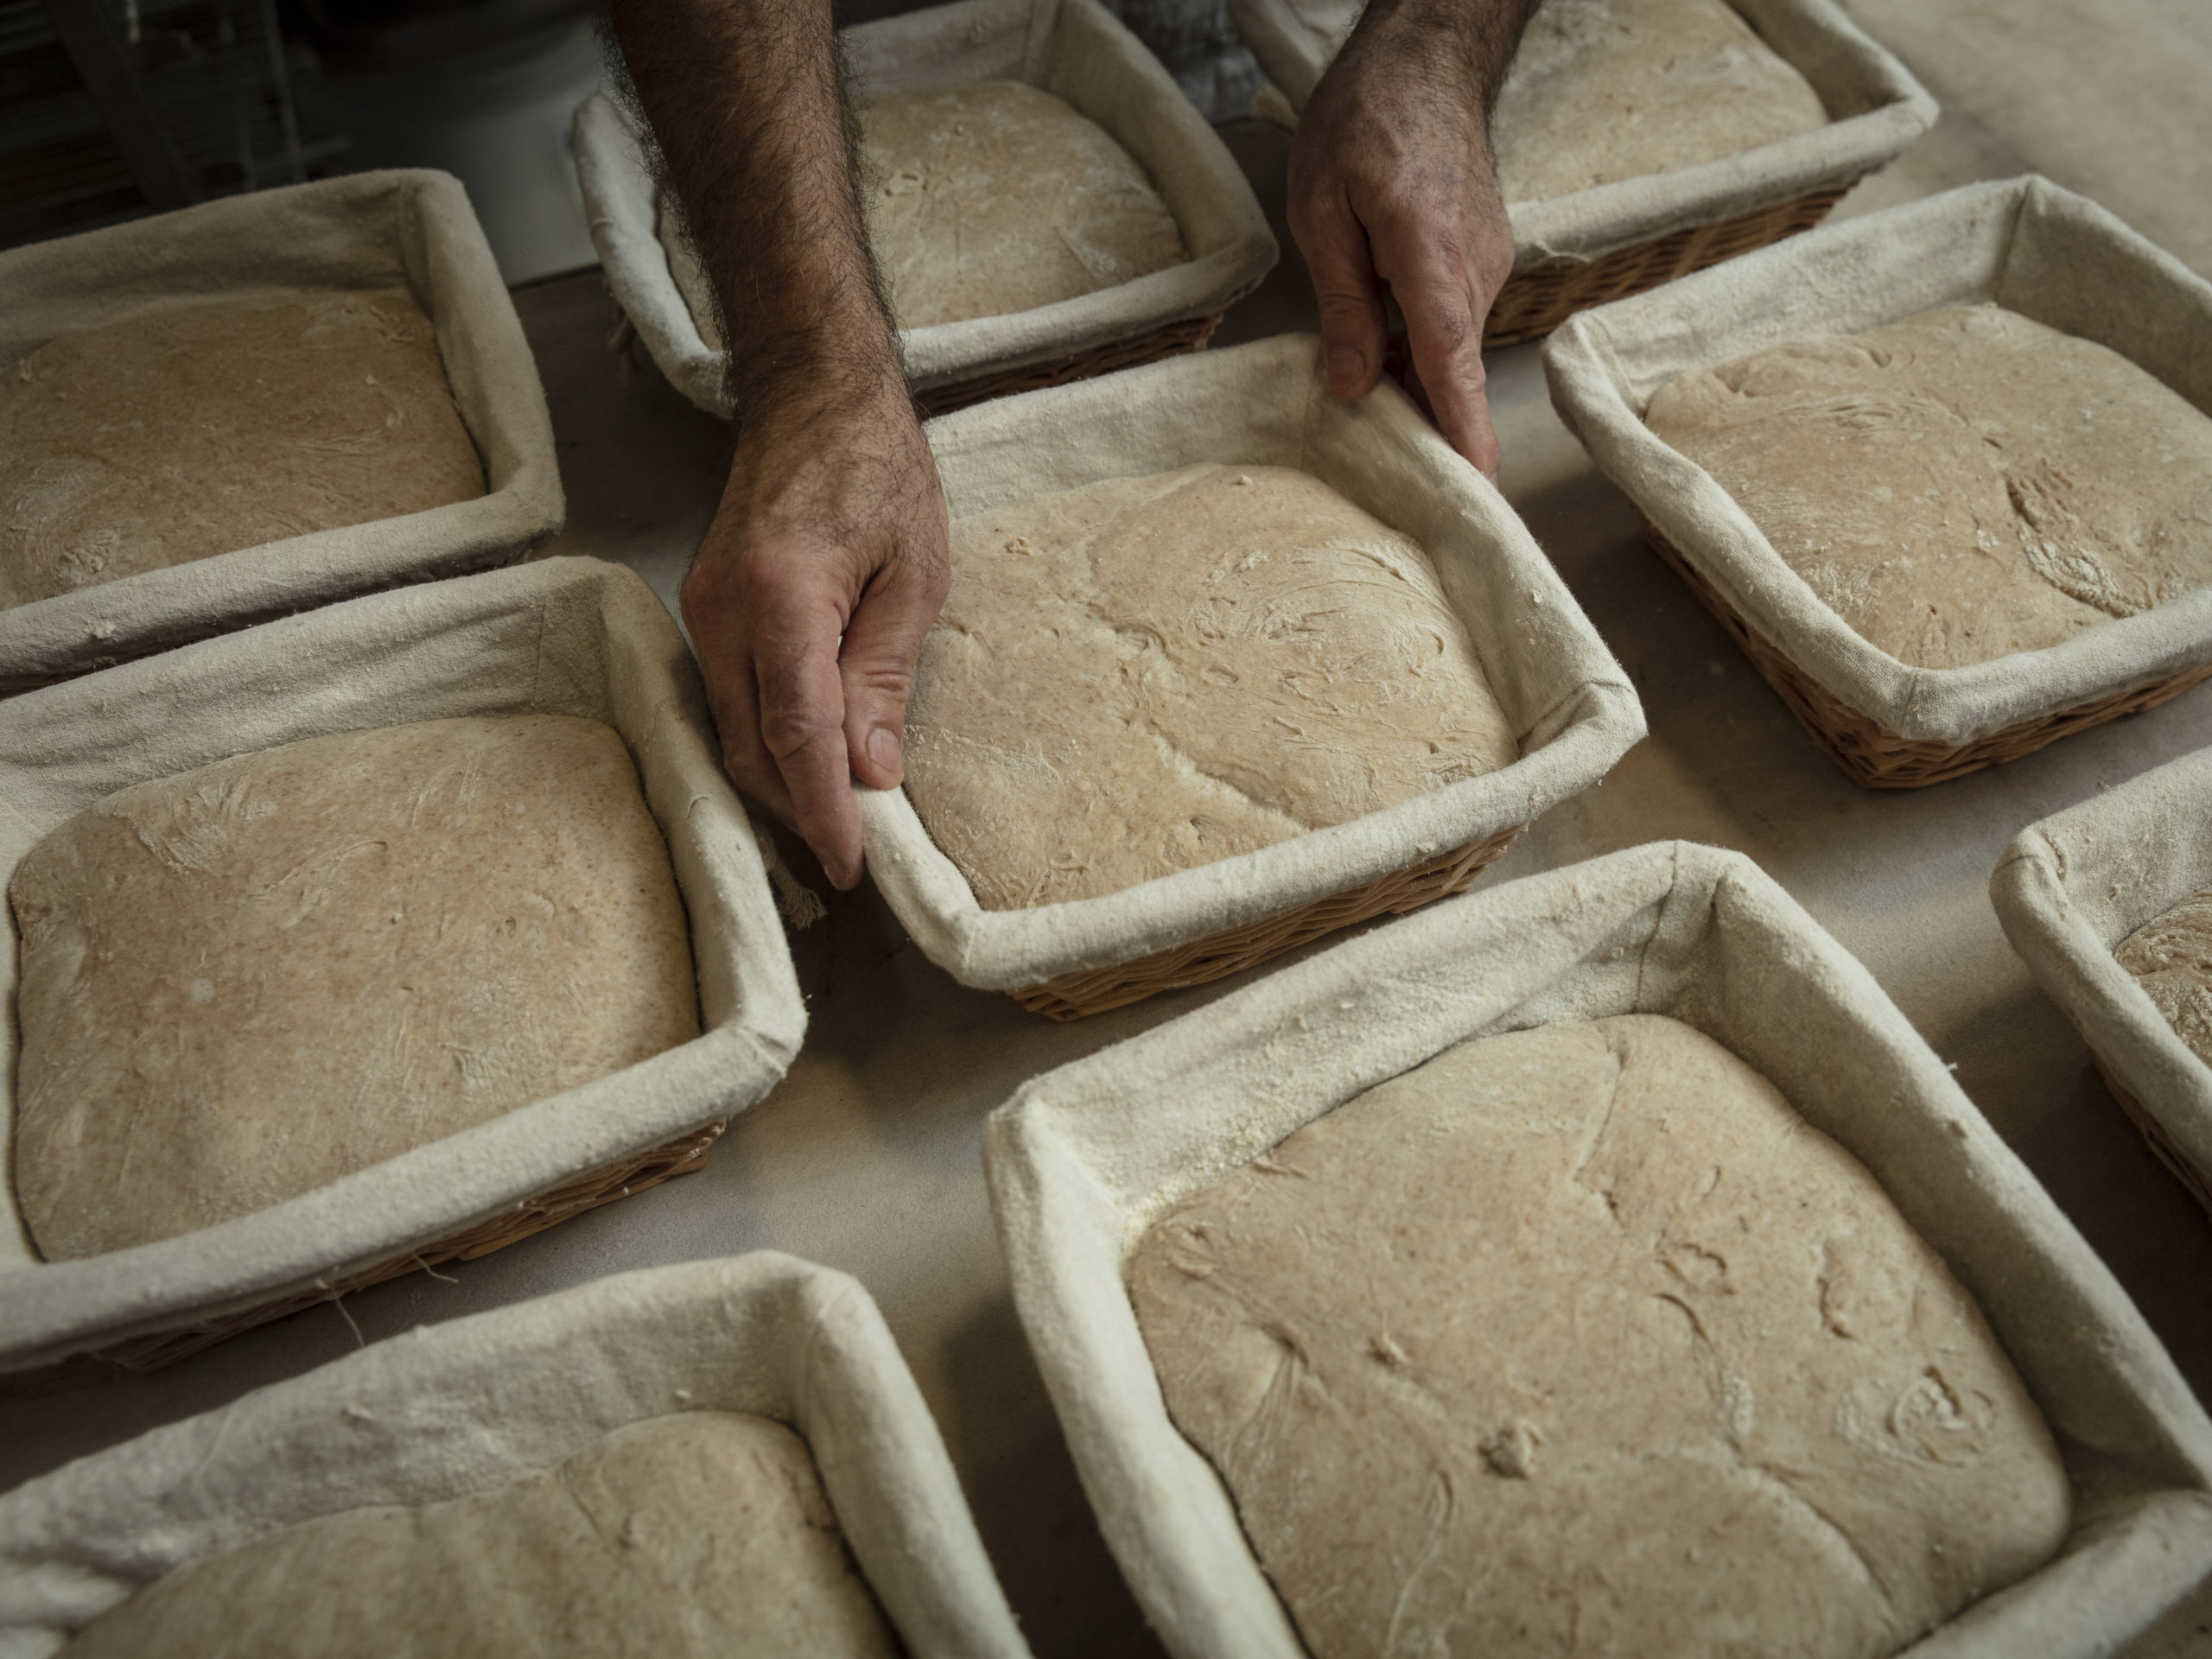 Petit déjeuner au pain salvator